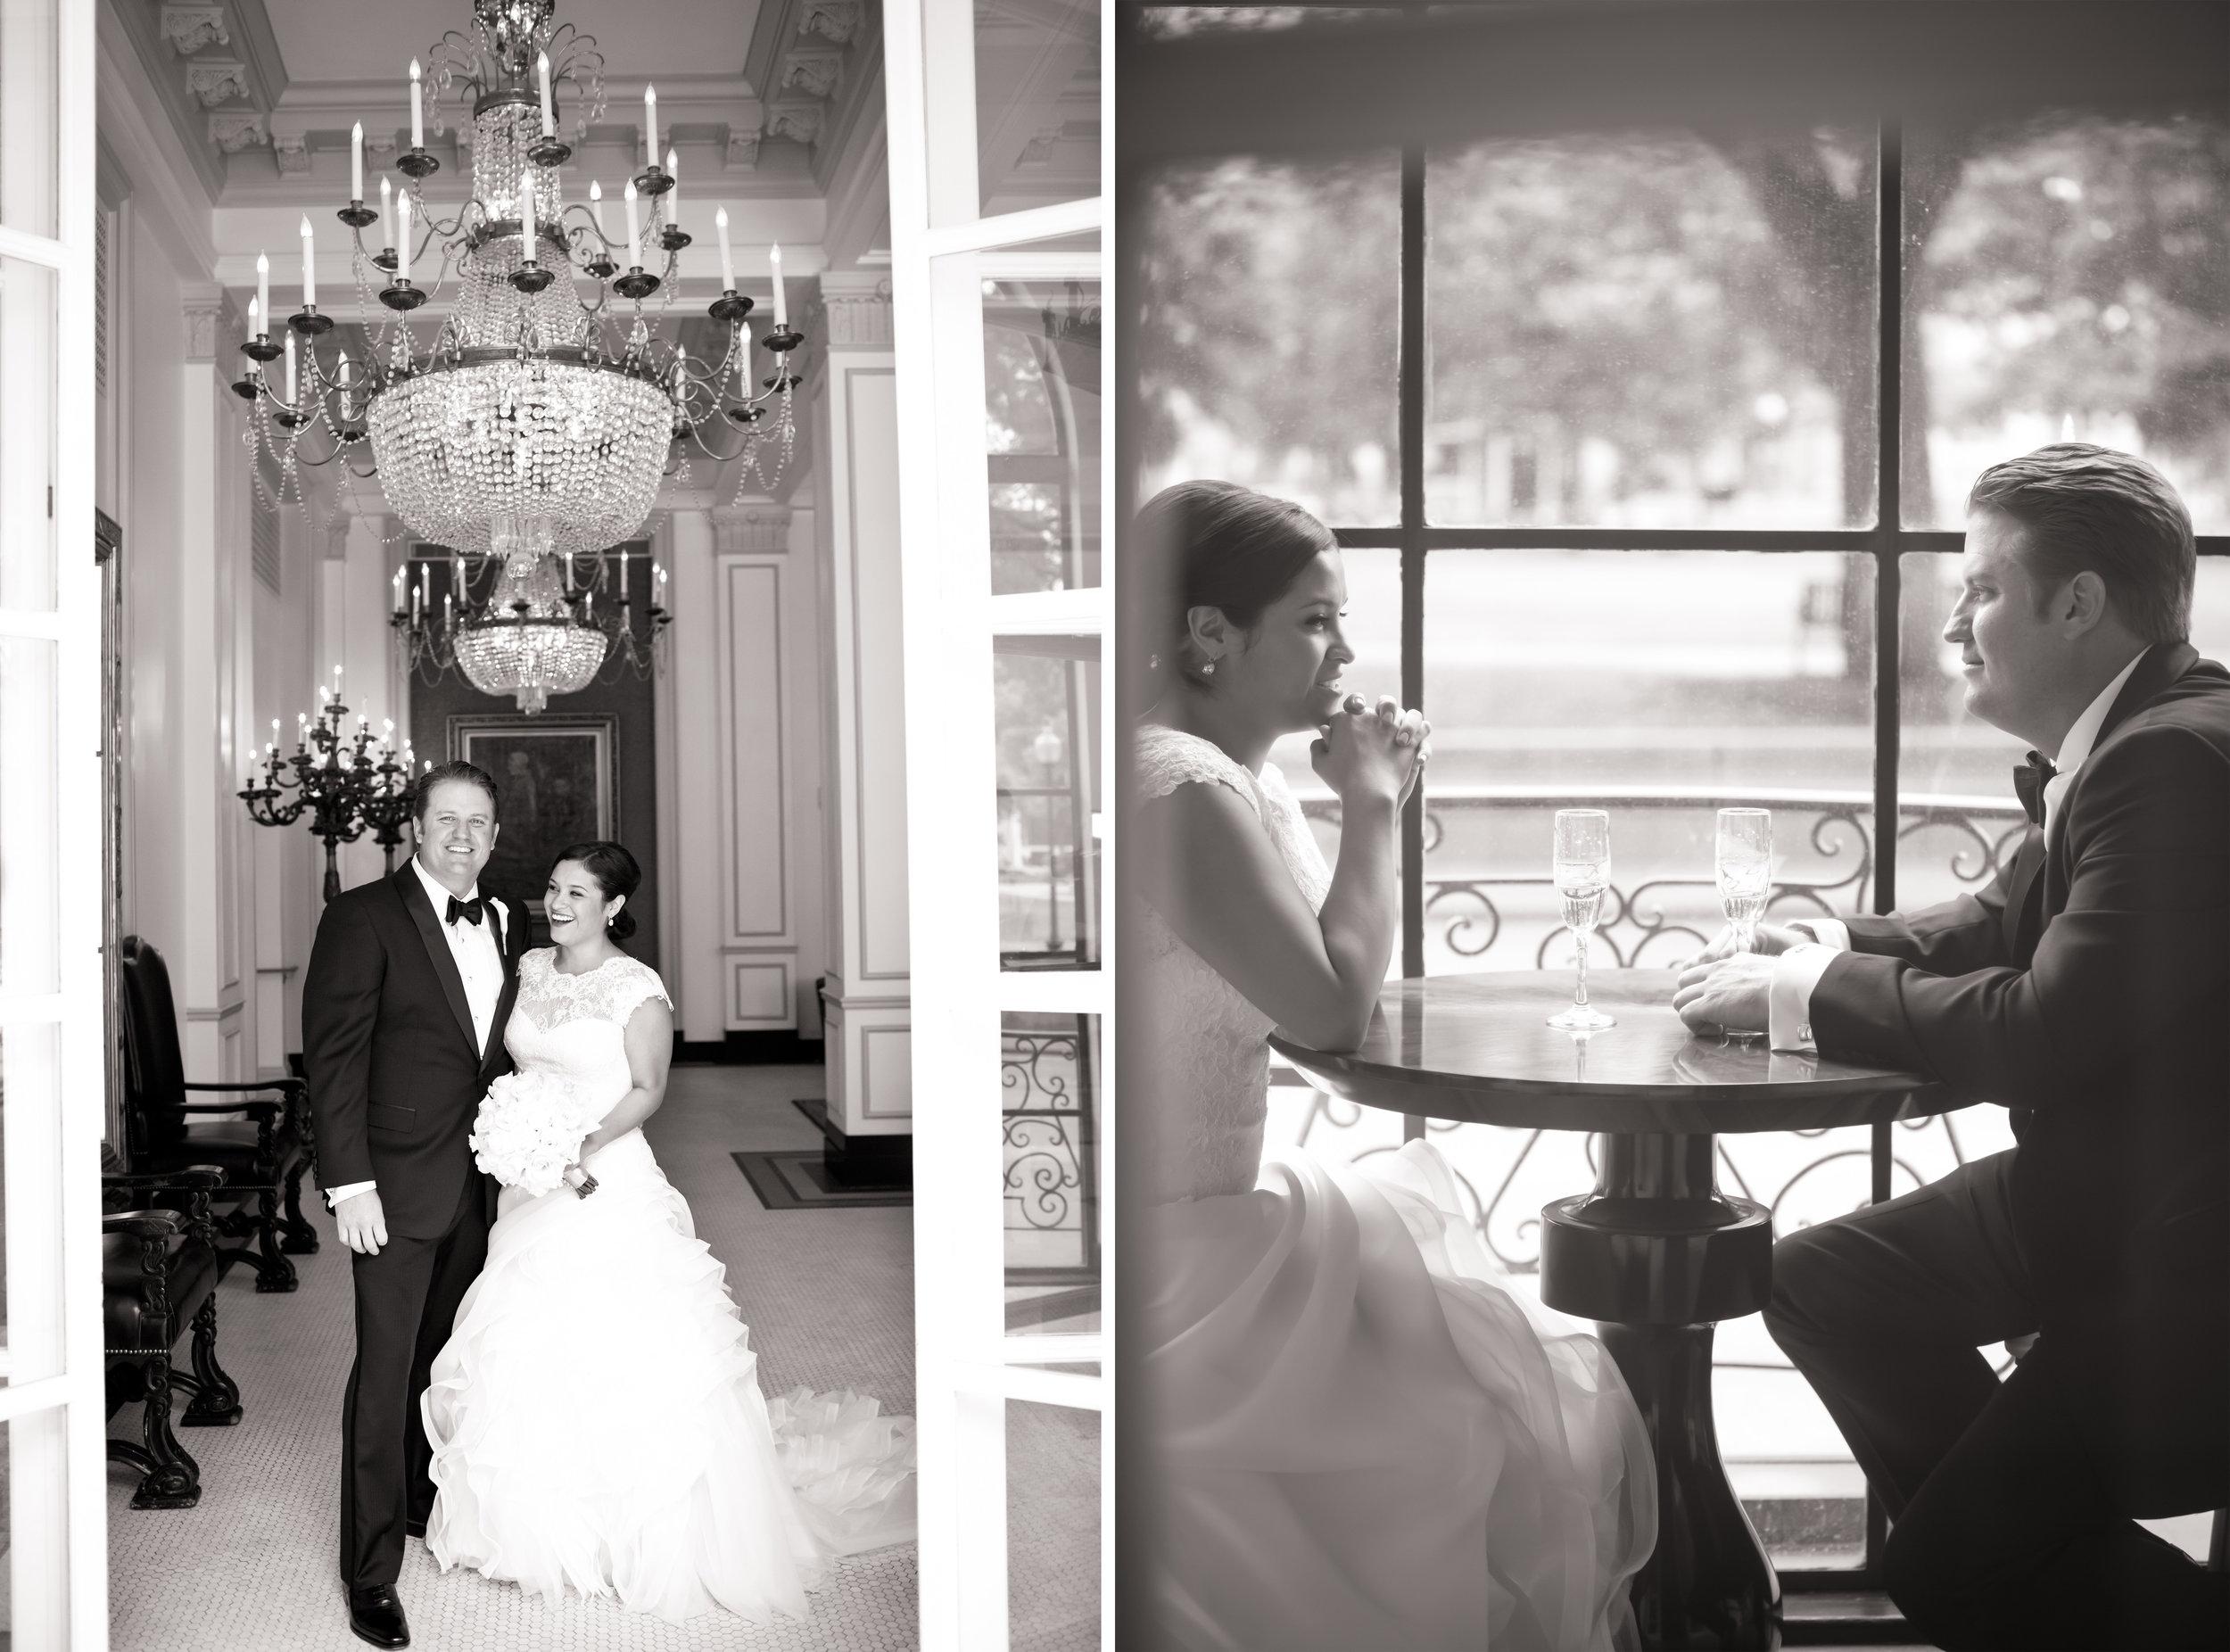 Marble_Falls_Horseshoe_Bay_Photographer_Torres_Wedding_18.jpg